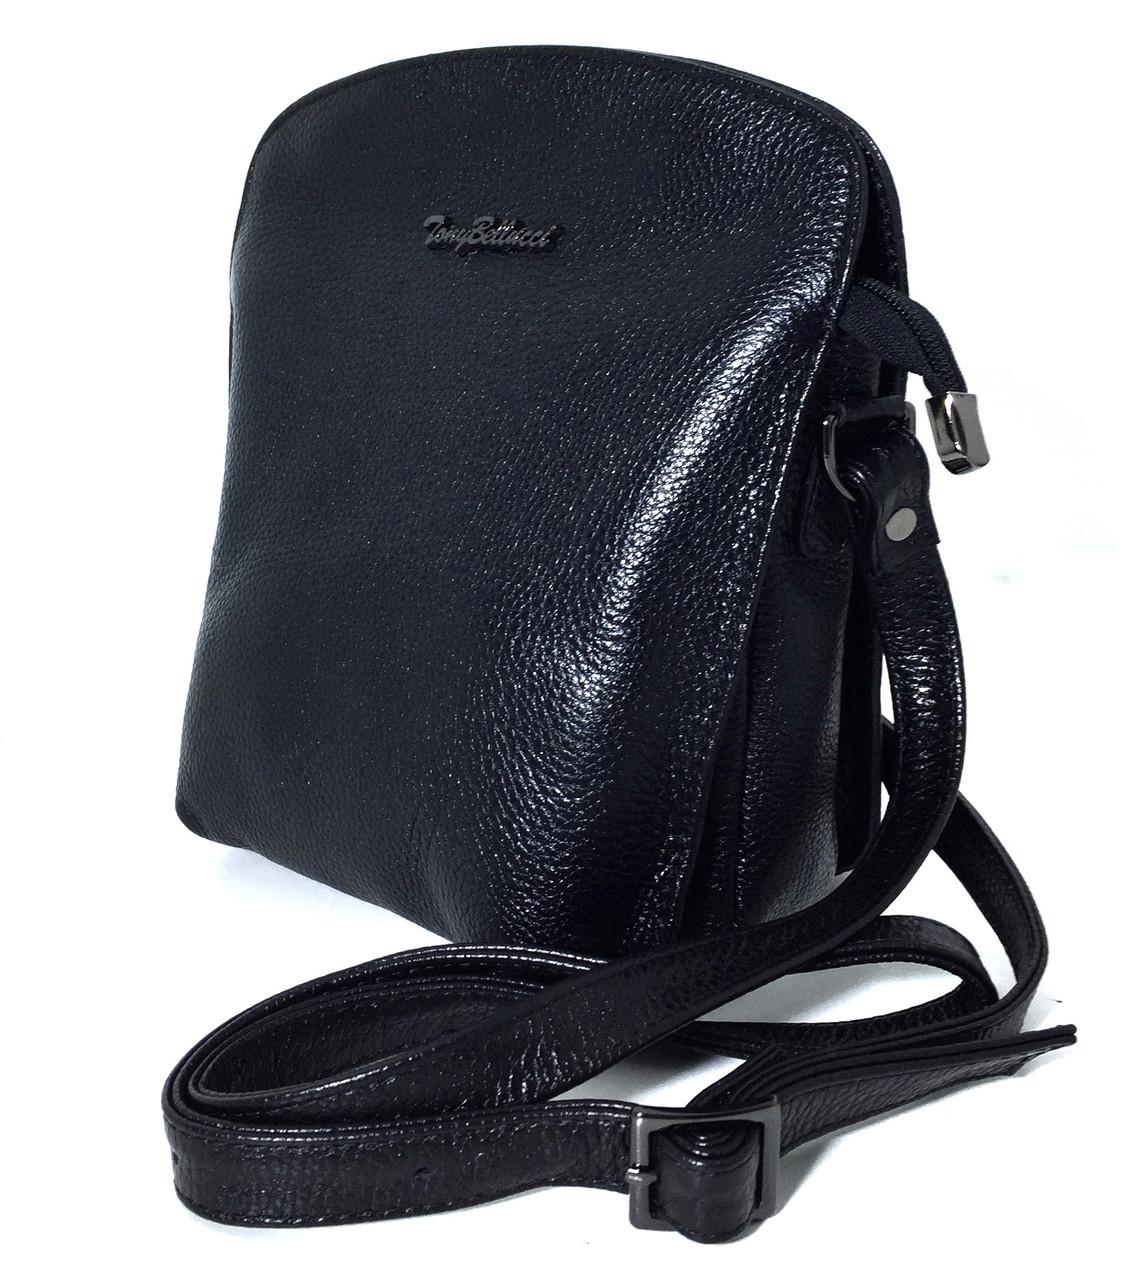 59bd4c7bb990 Купить женскую сумку Dizar S-9093 23*19*4см флотер слон, темно ...